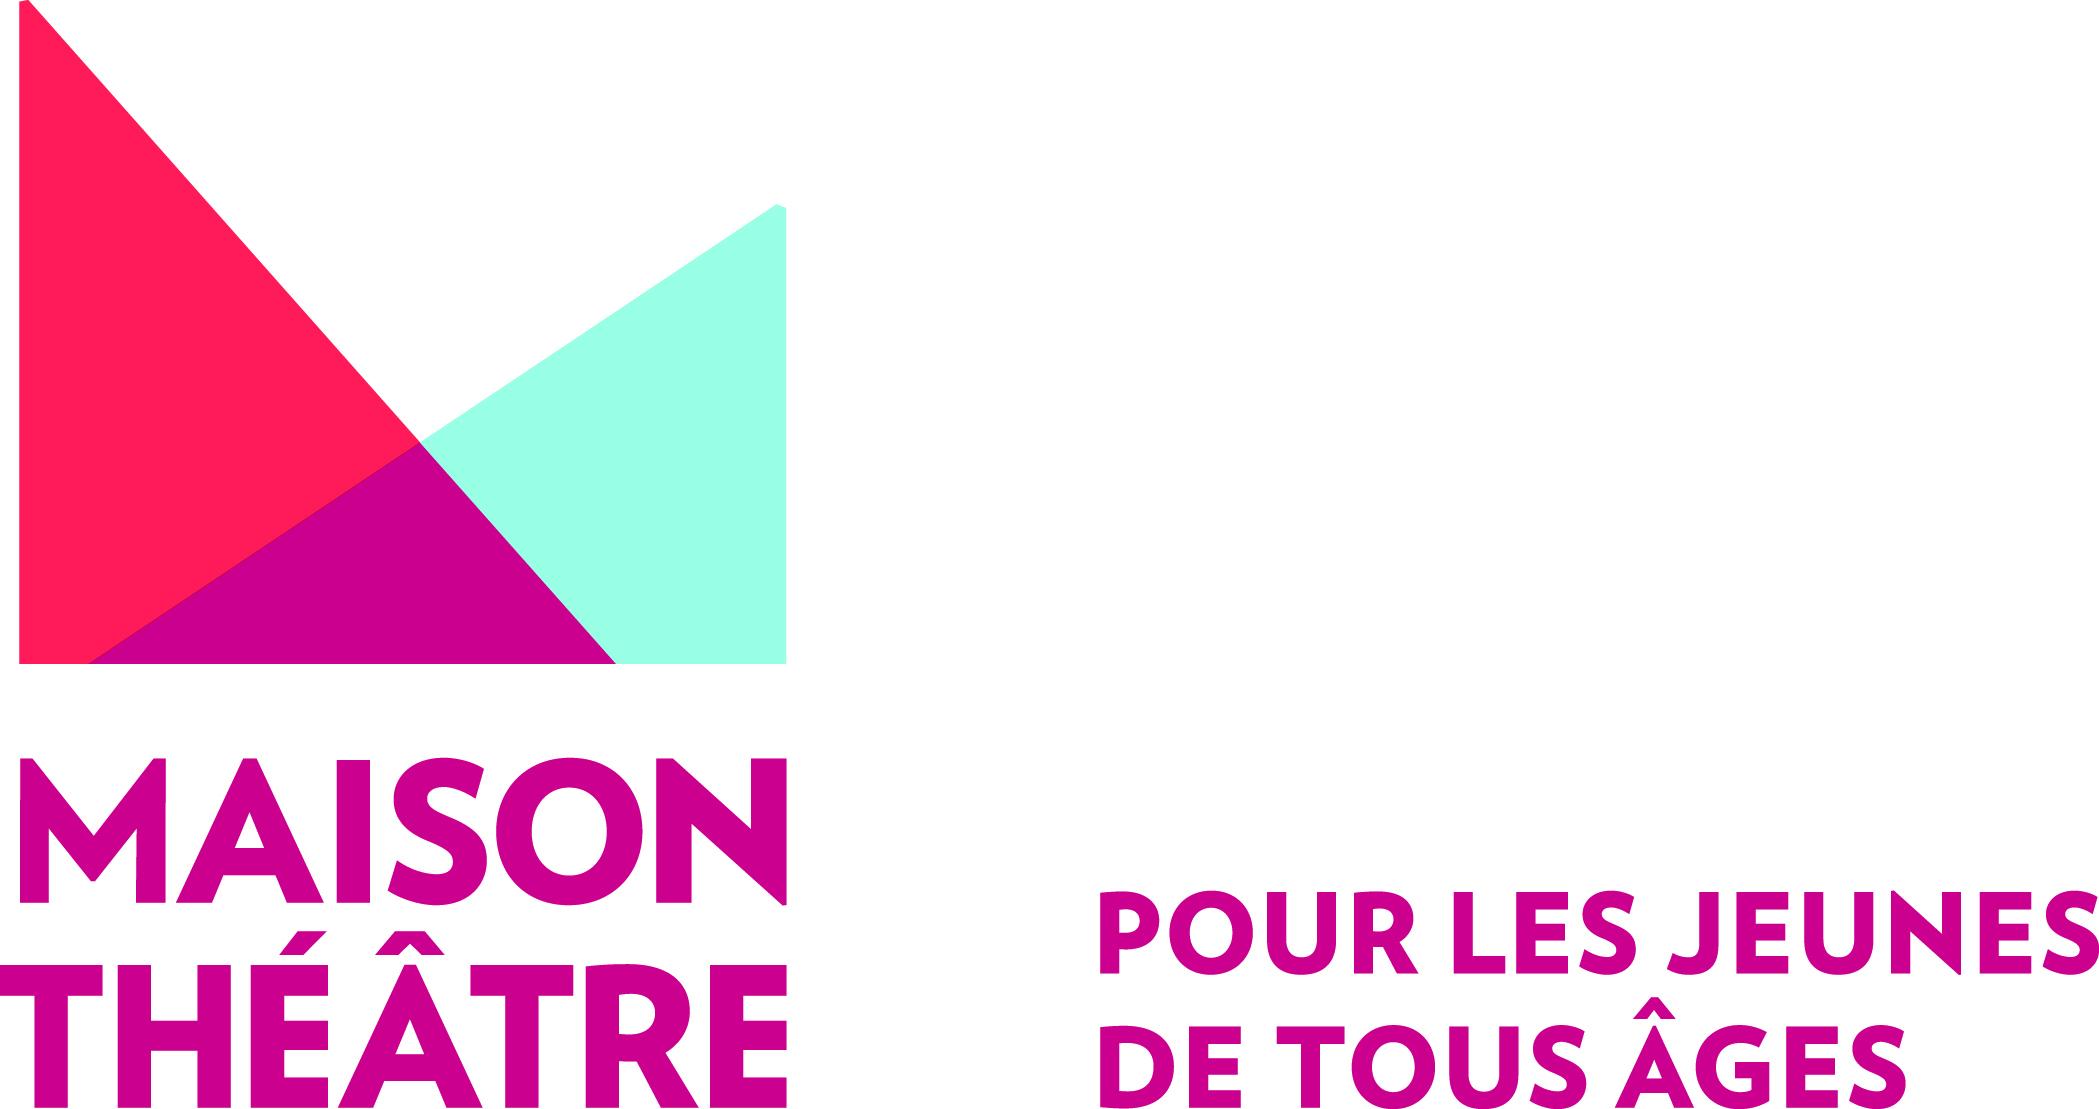 Maison Theatre 2012.jpg